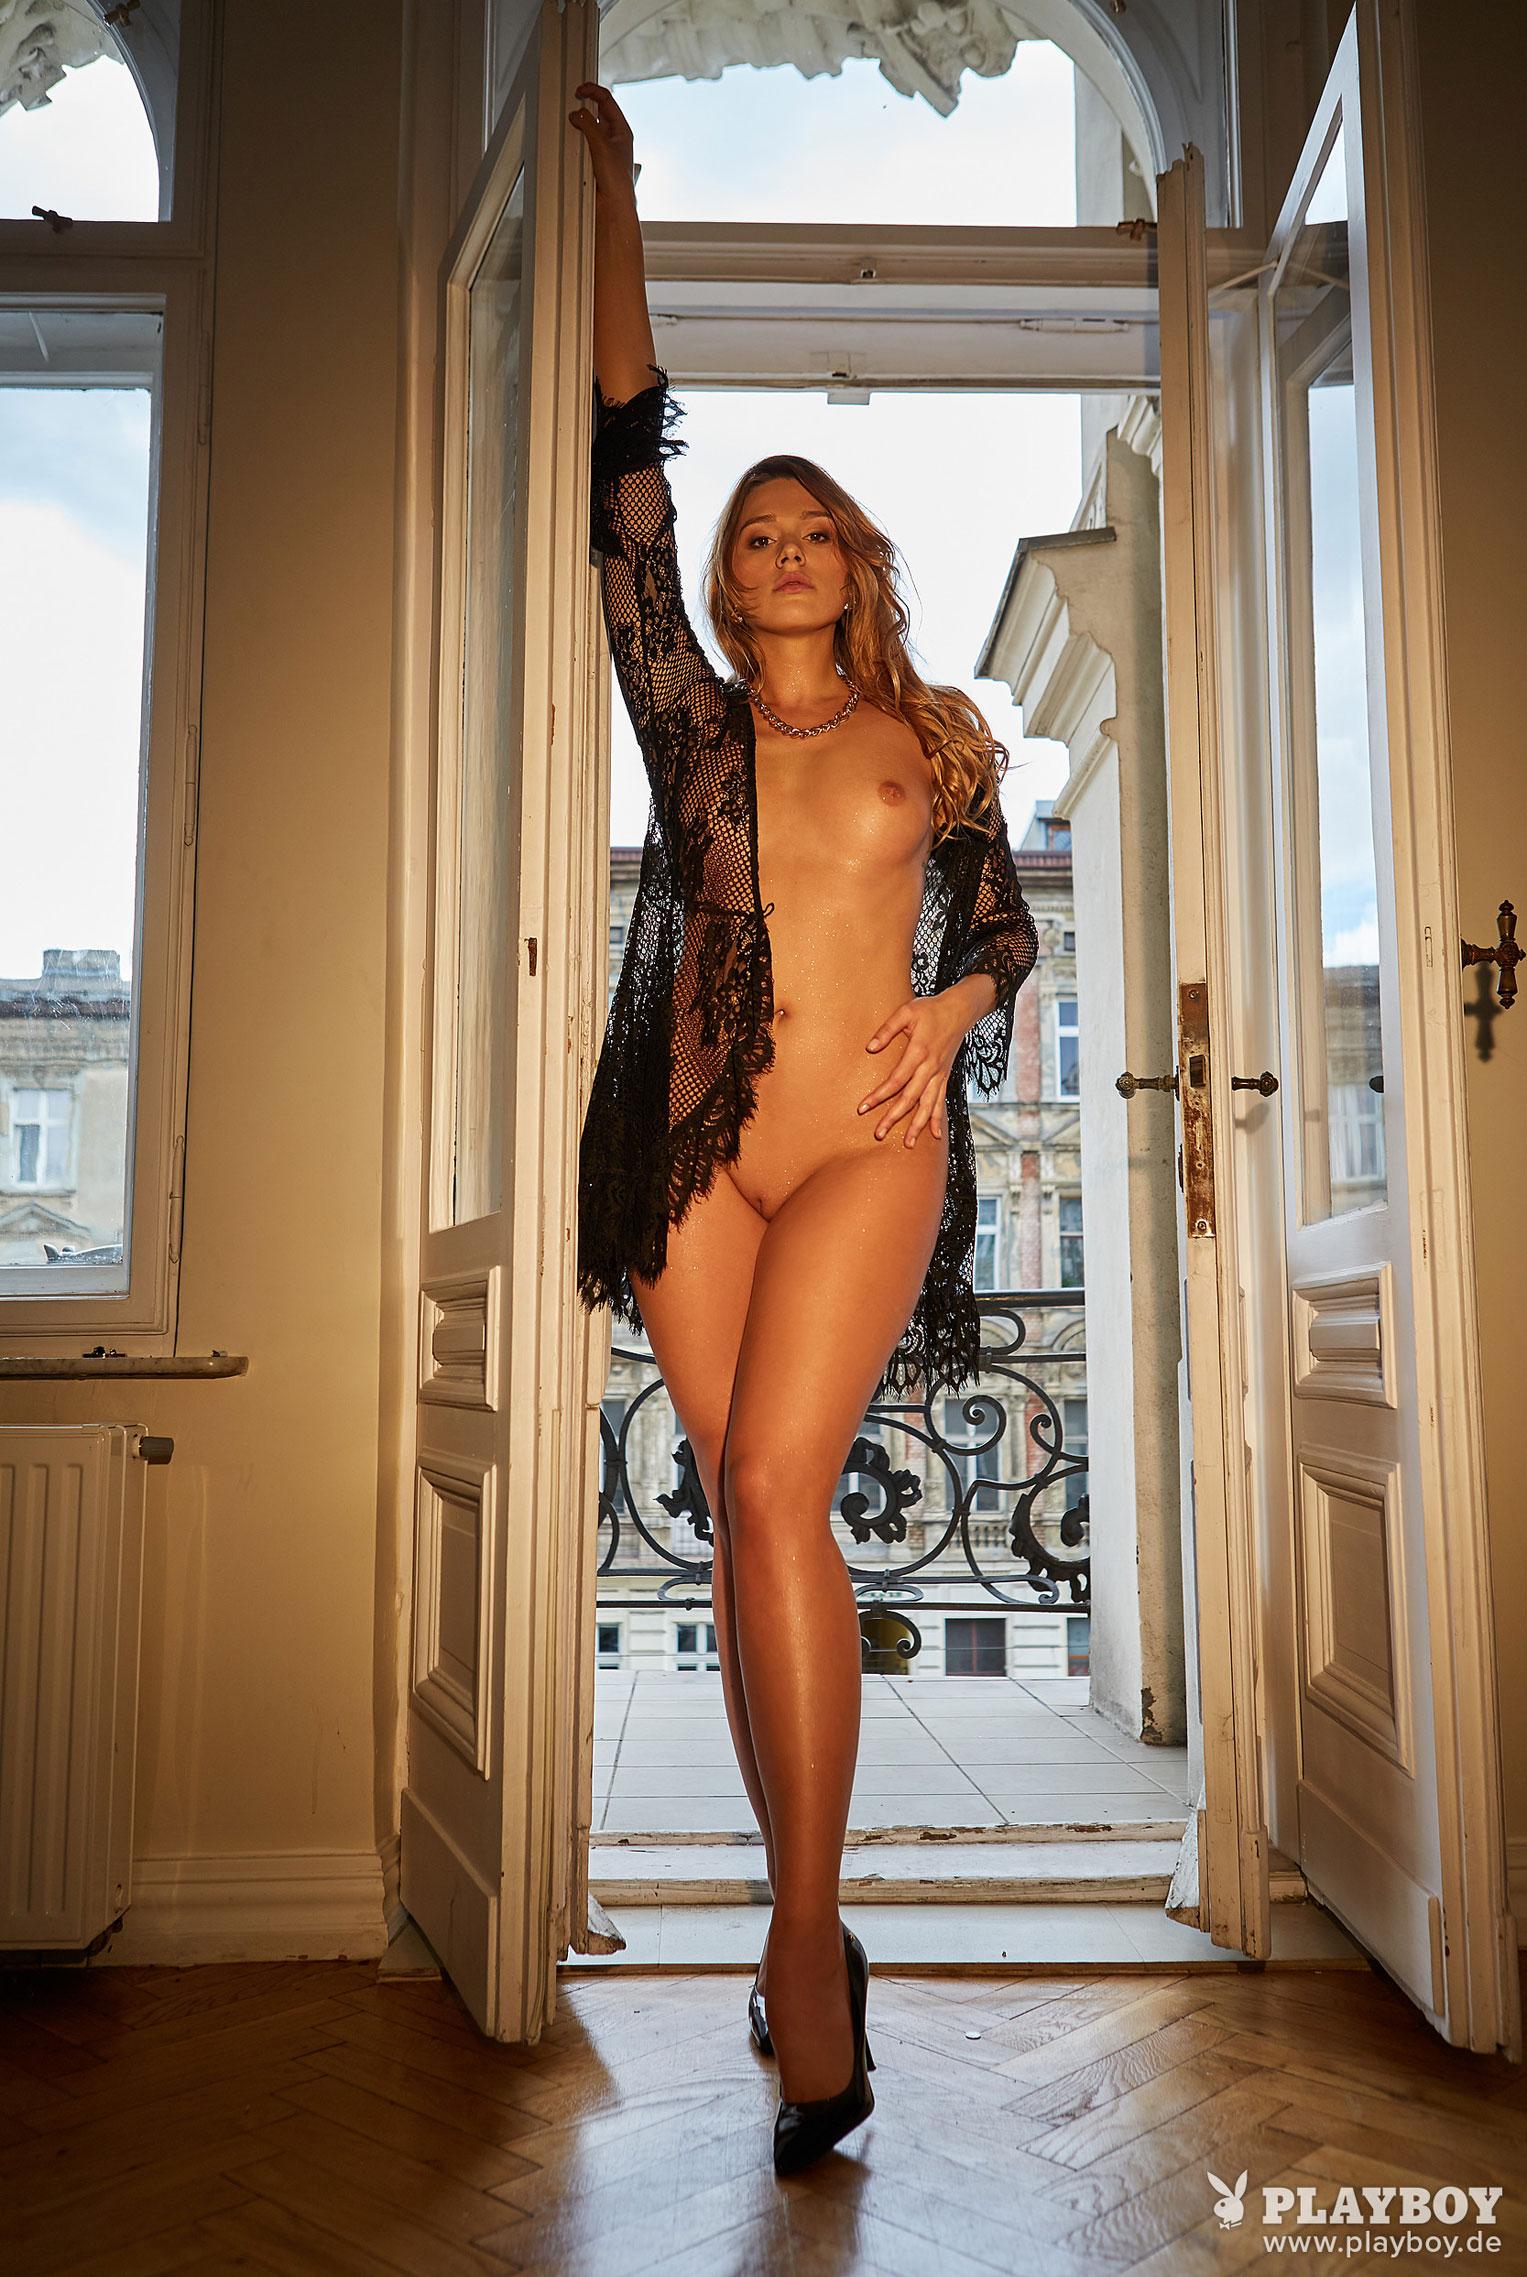 Девушка месяца Playboy Германия декабрь 2019 - Лена Беднарска / фото 02